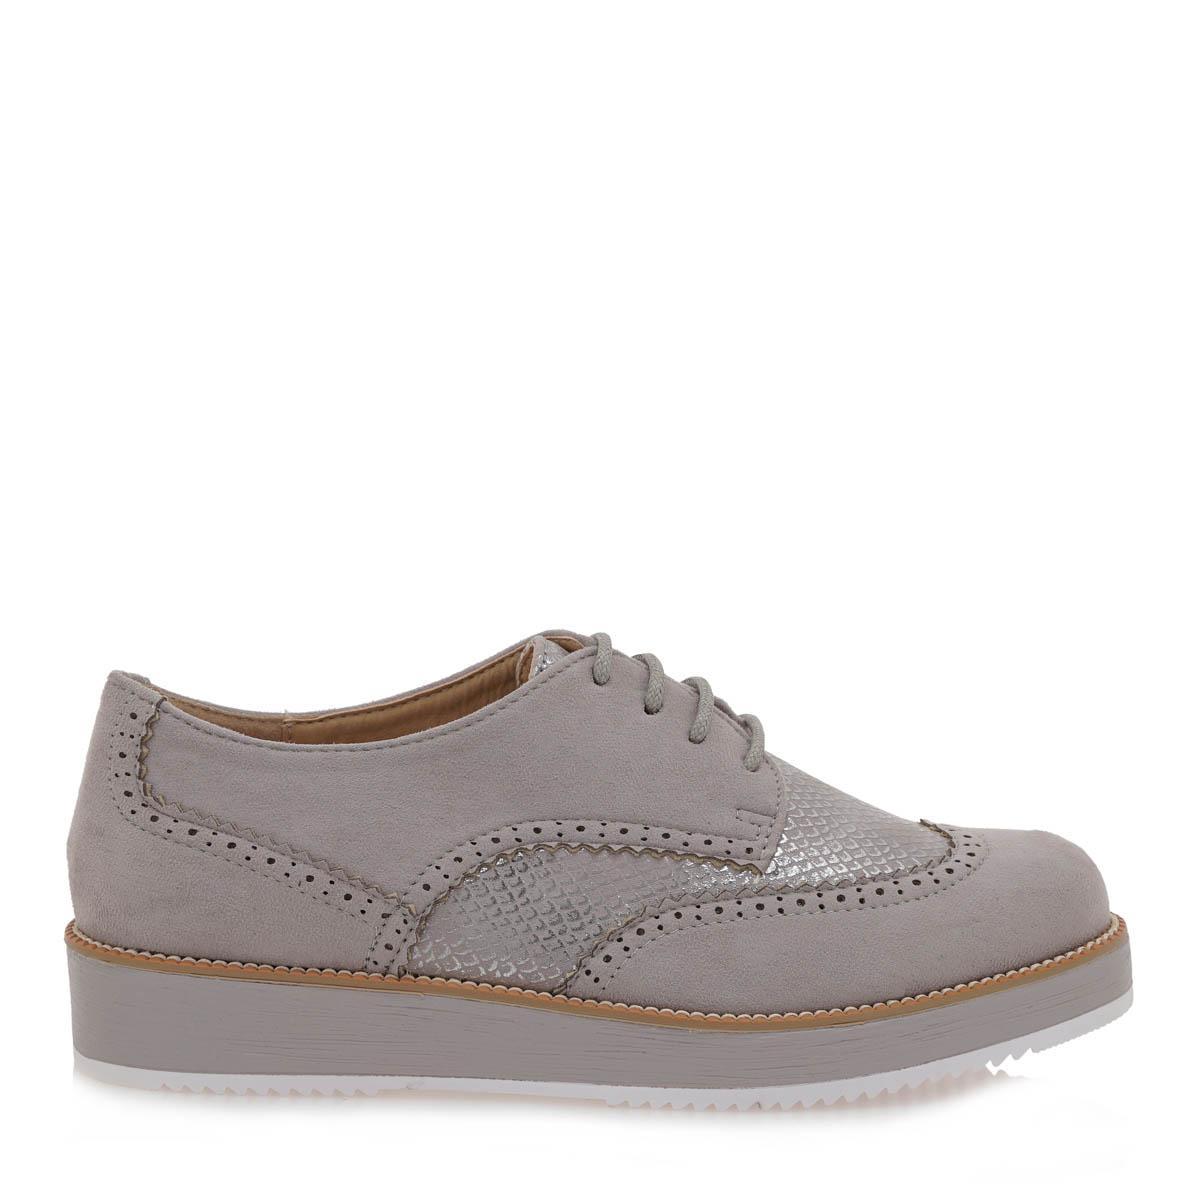 76a897f26bb Γυναικεία Παπούτσια, Γυναικεία Casual, Oxfords